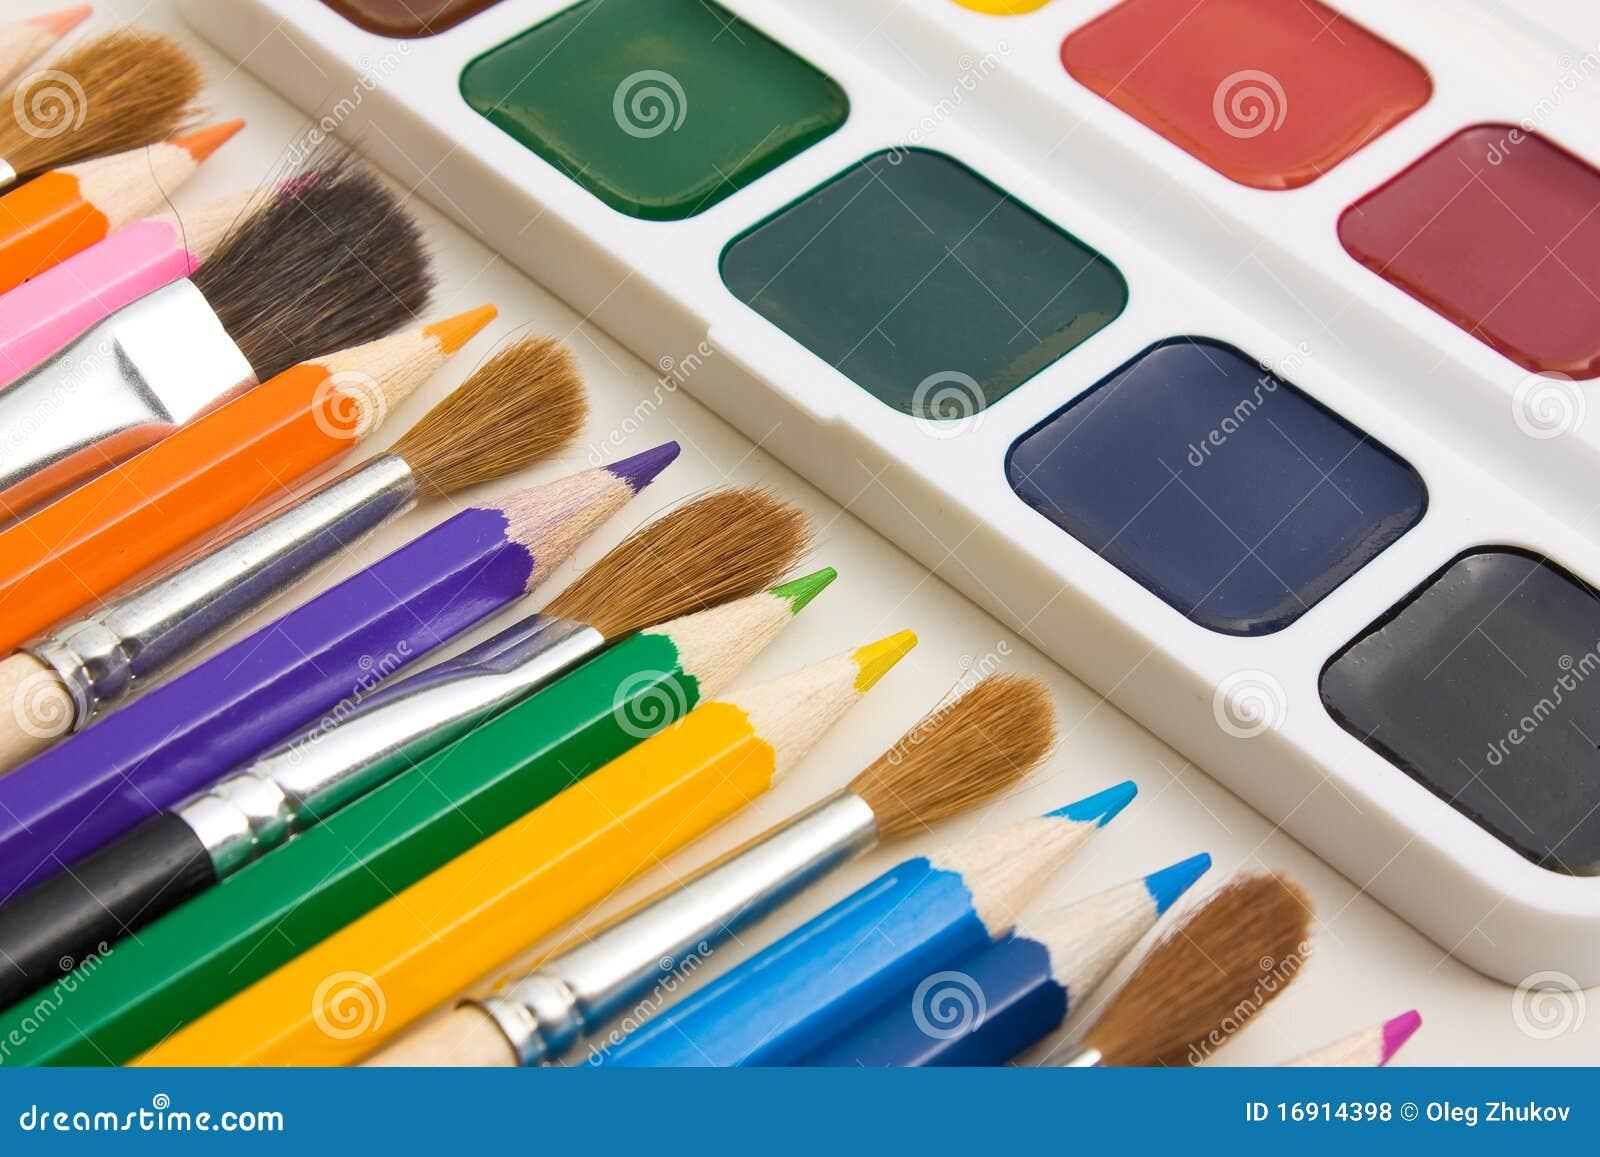 Drawing Tools Royalty Free Stock Photos Image 16914398